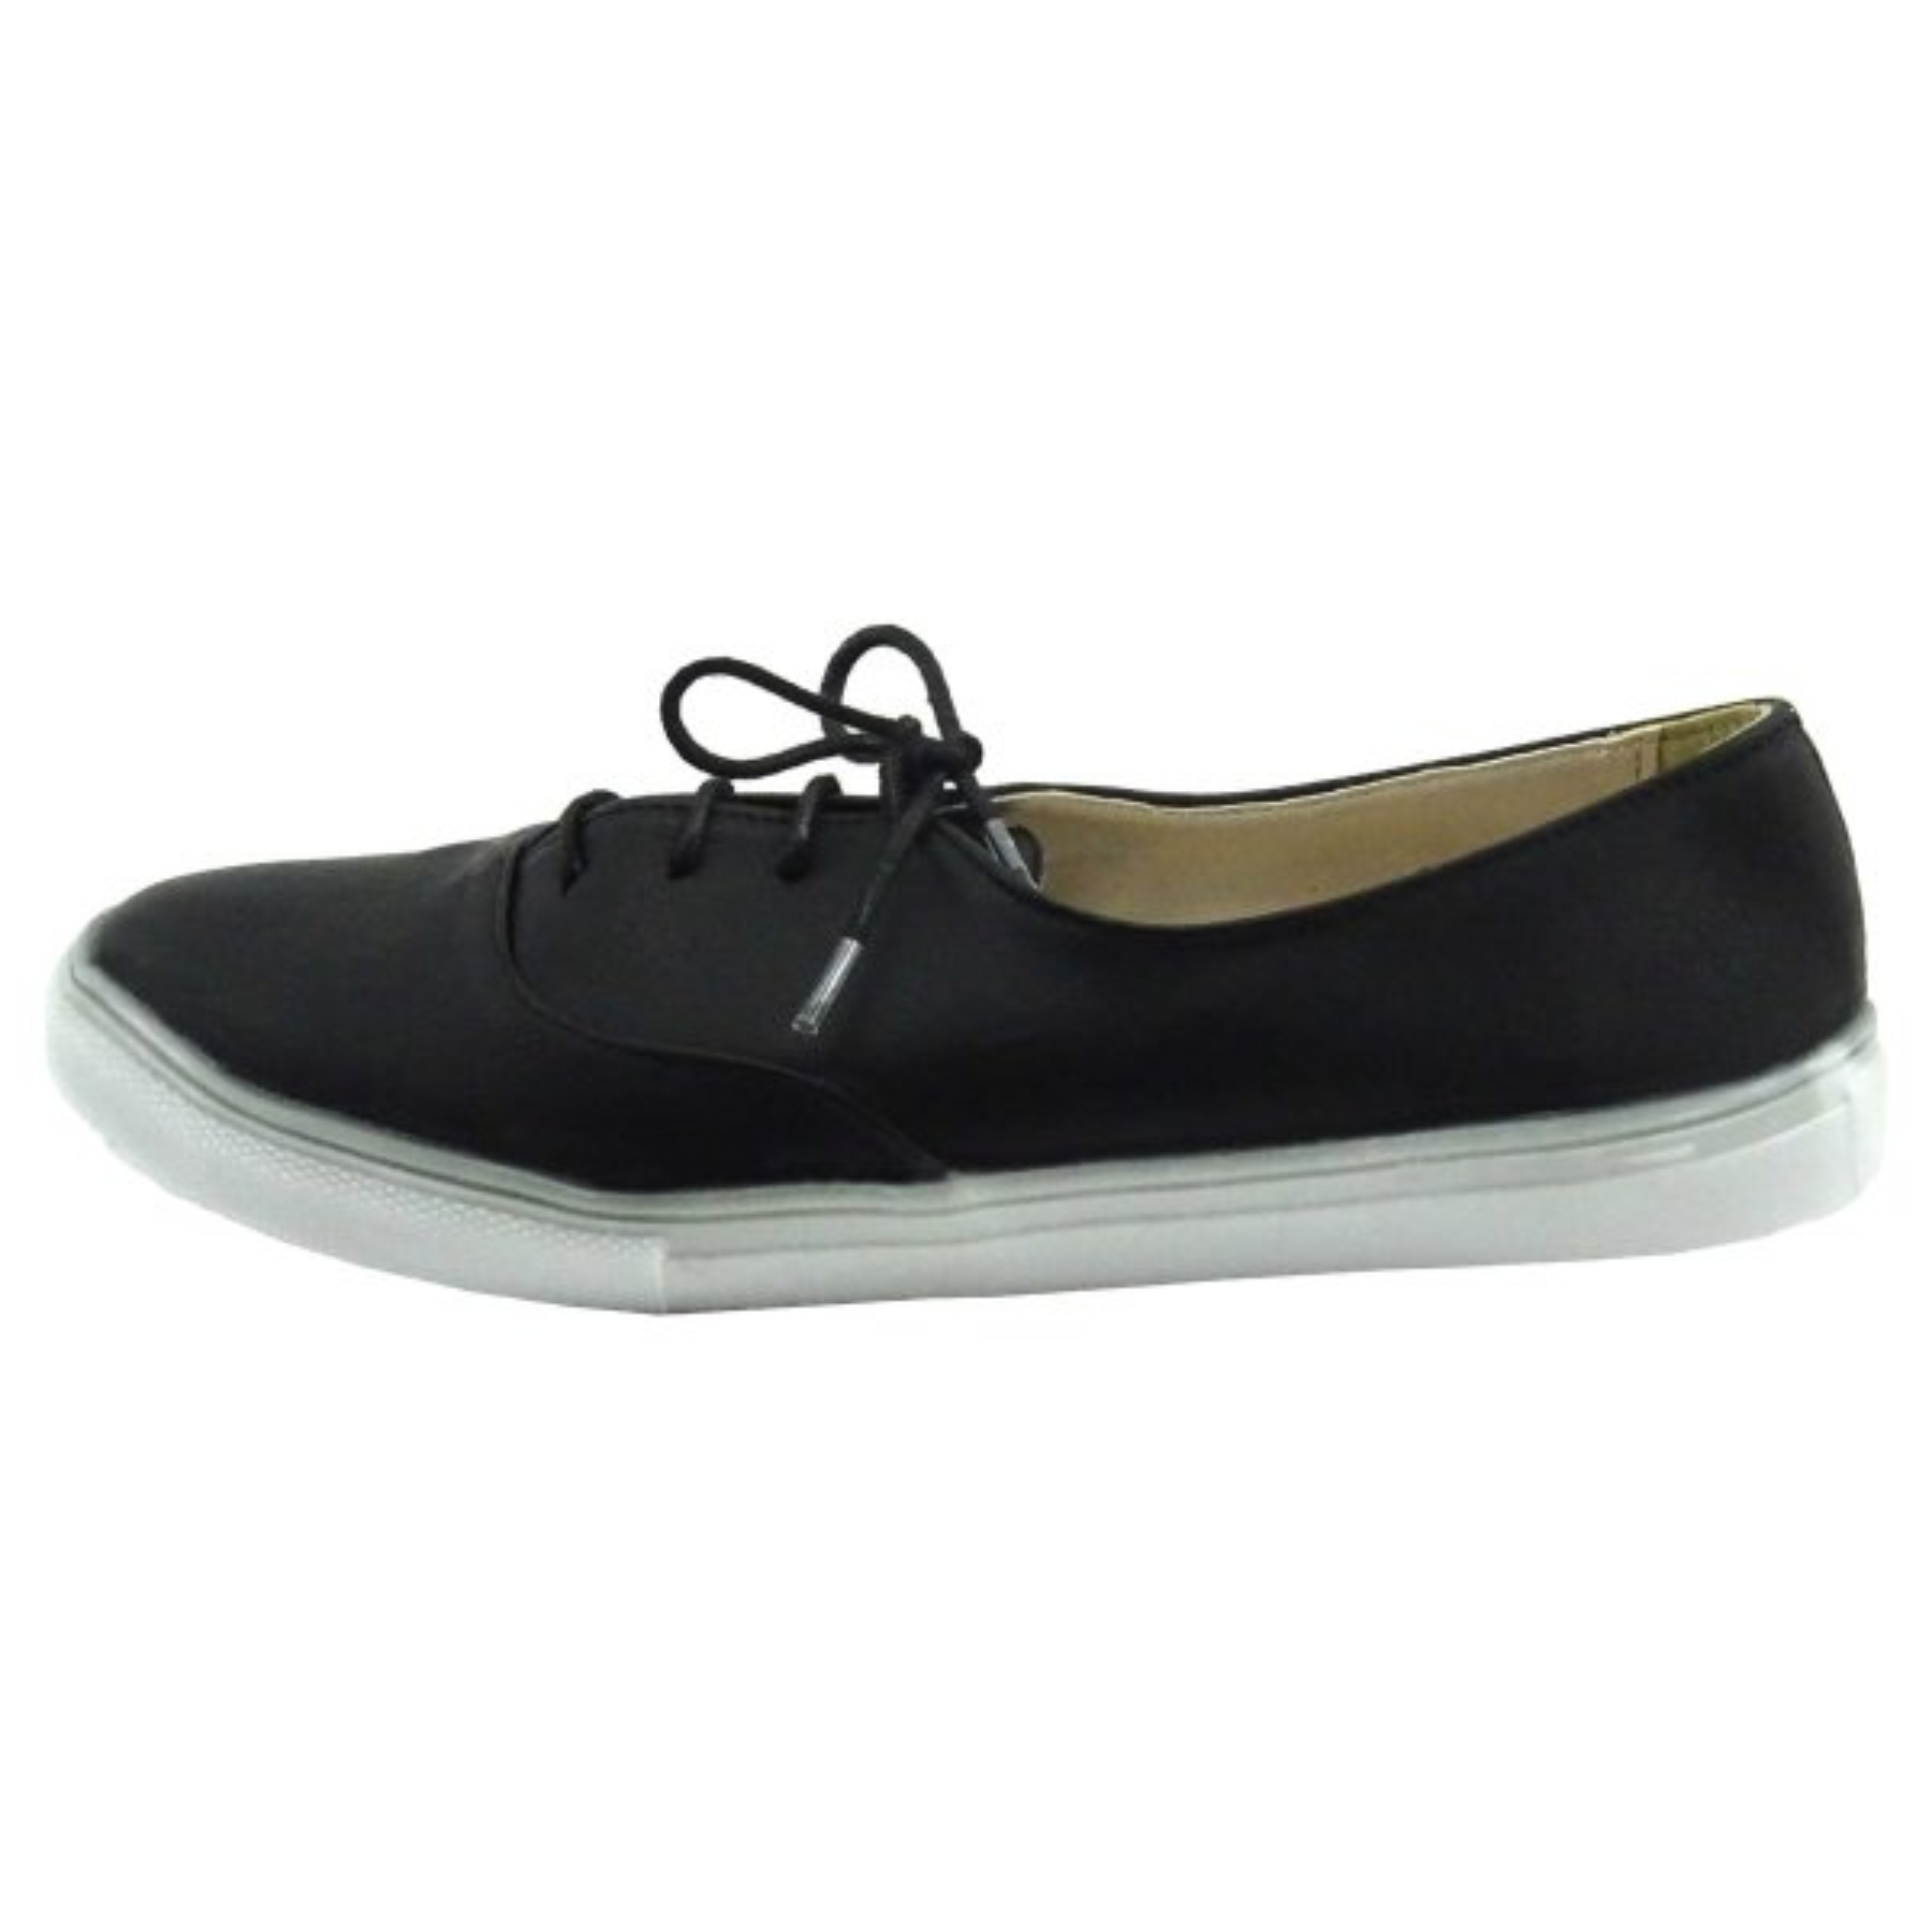 کفش روزمره زنانه آذاردو کد W03855